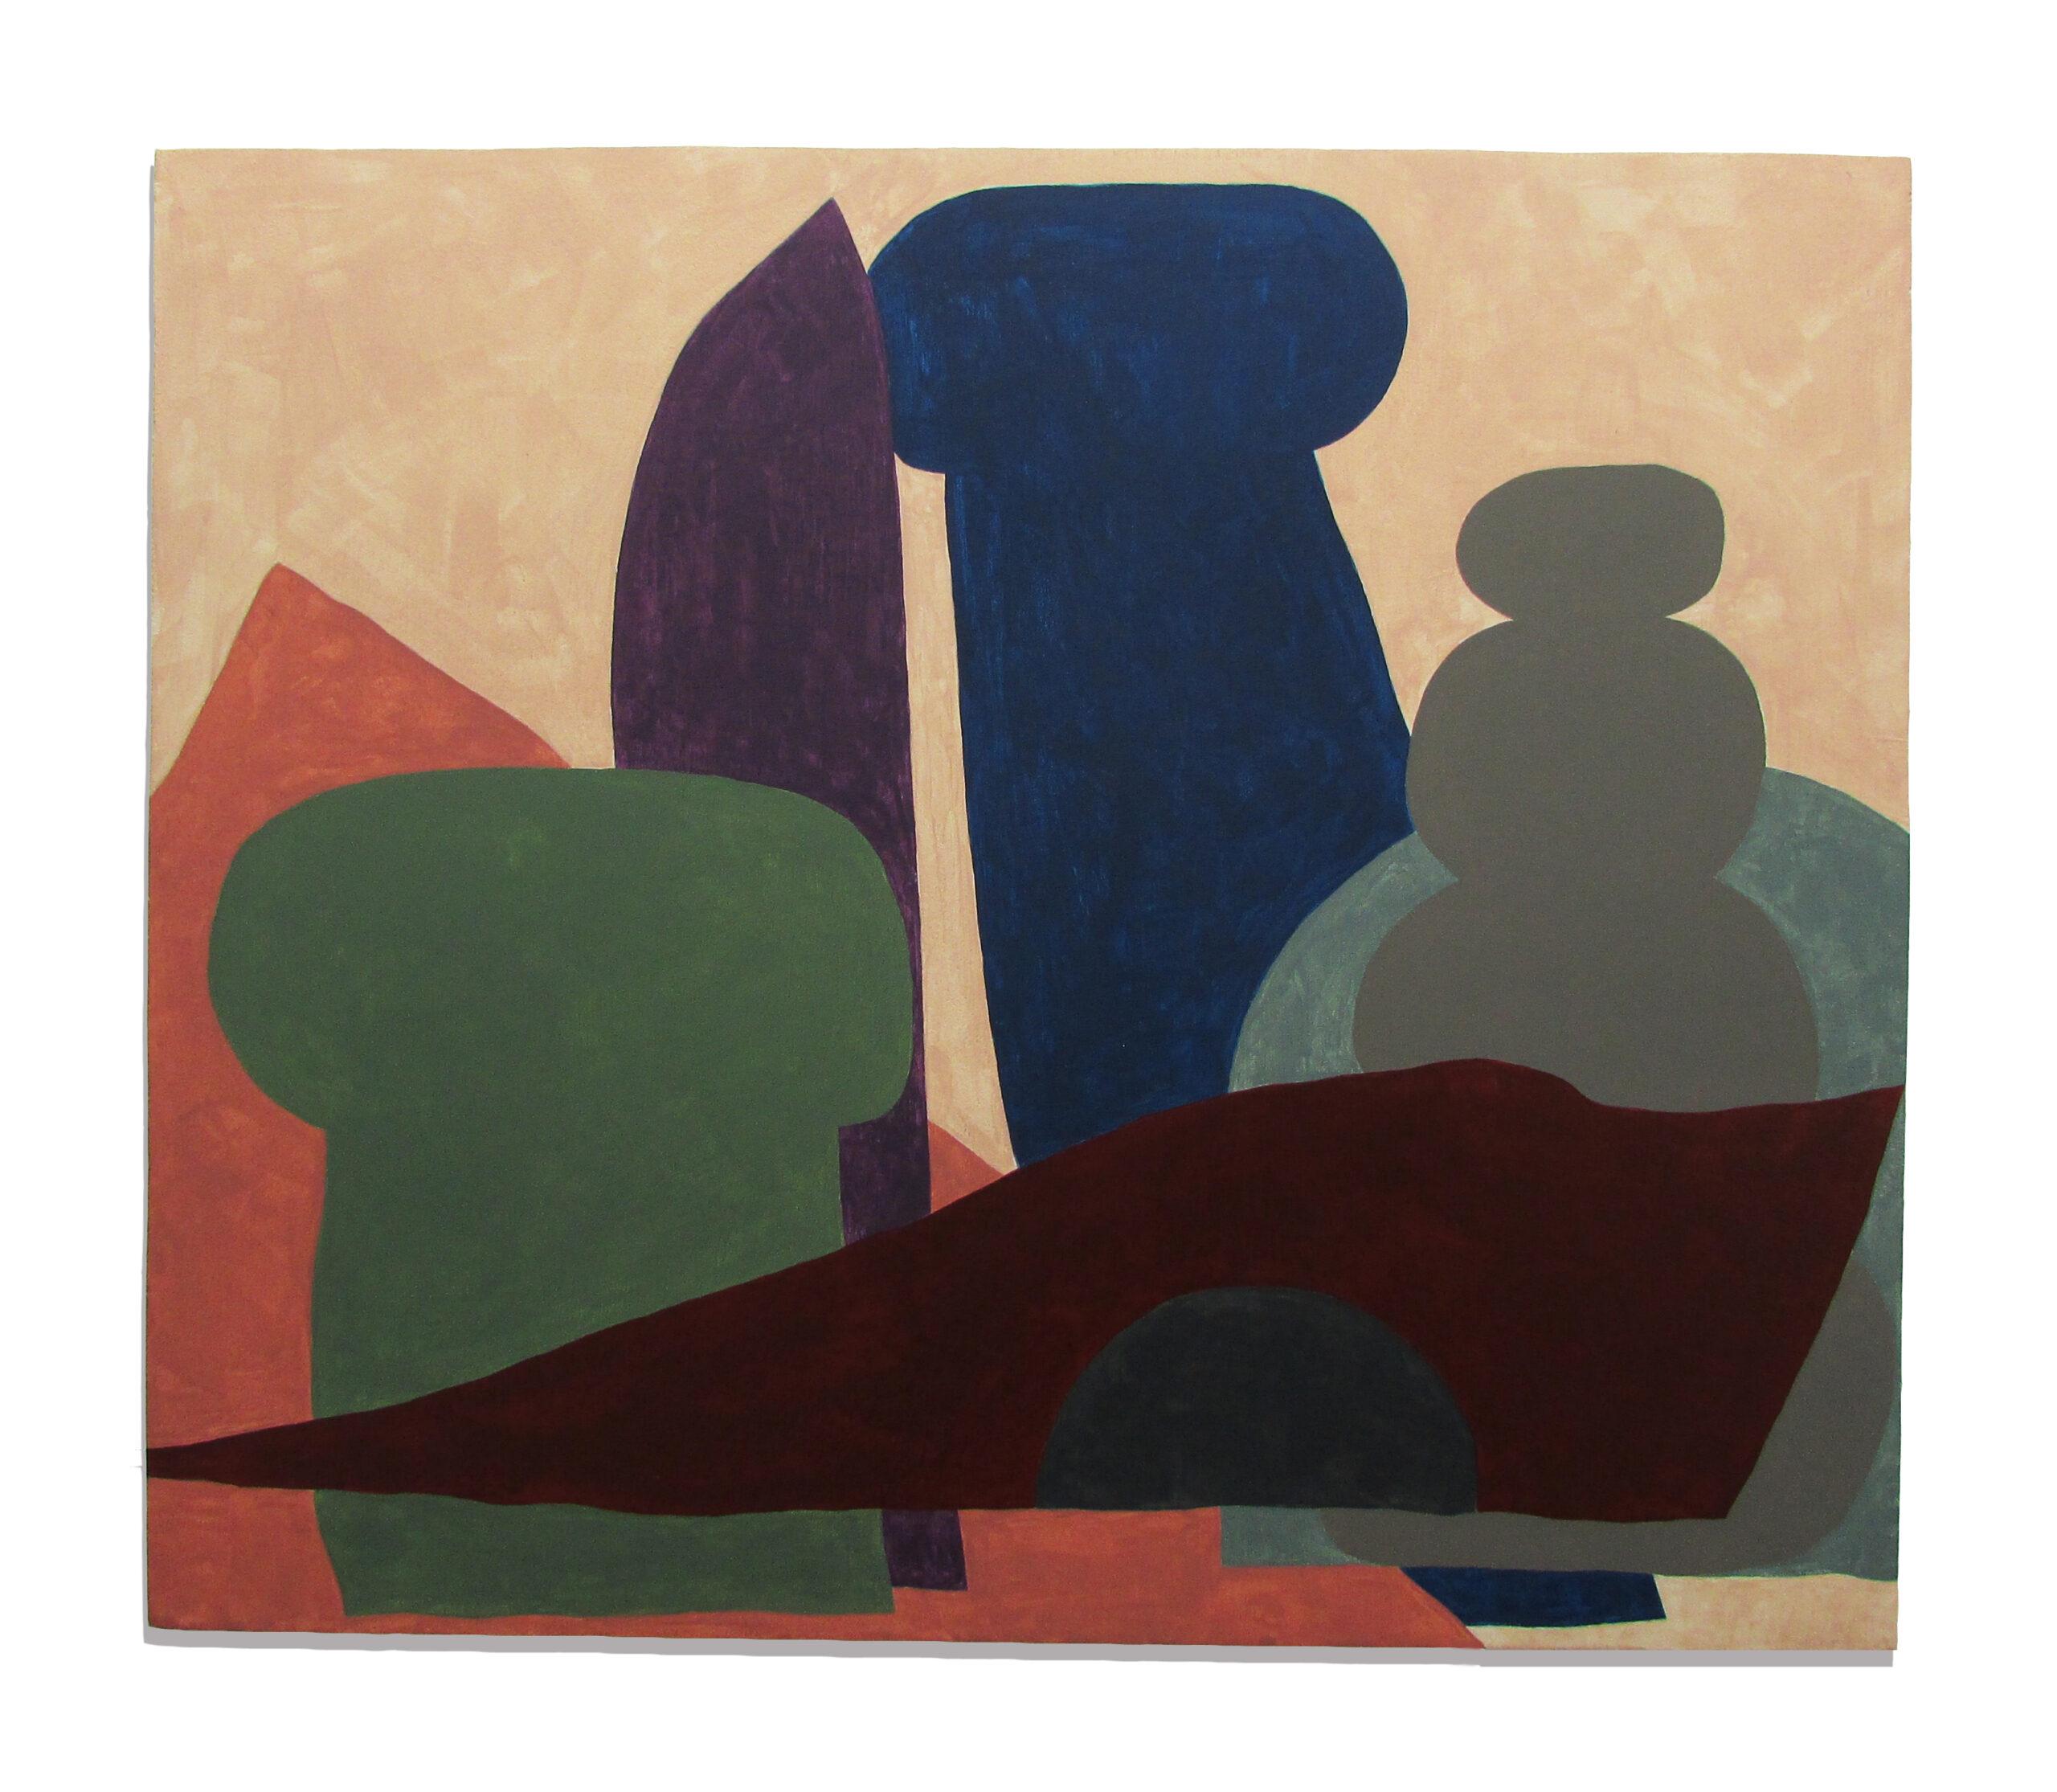 Jack Killick: Hopper (2019) Acrylic on board (43cm x 50.5cm).